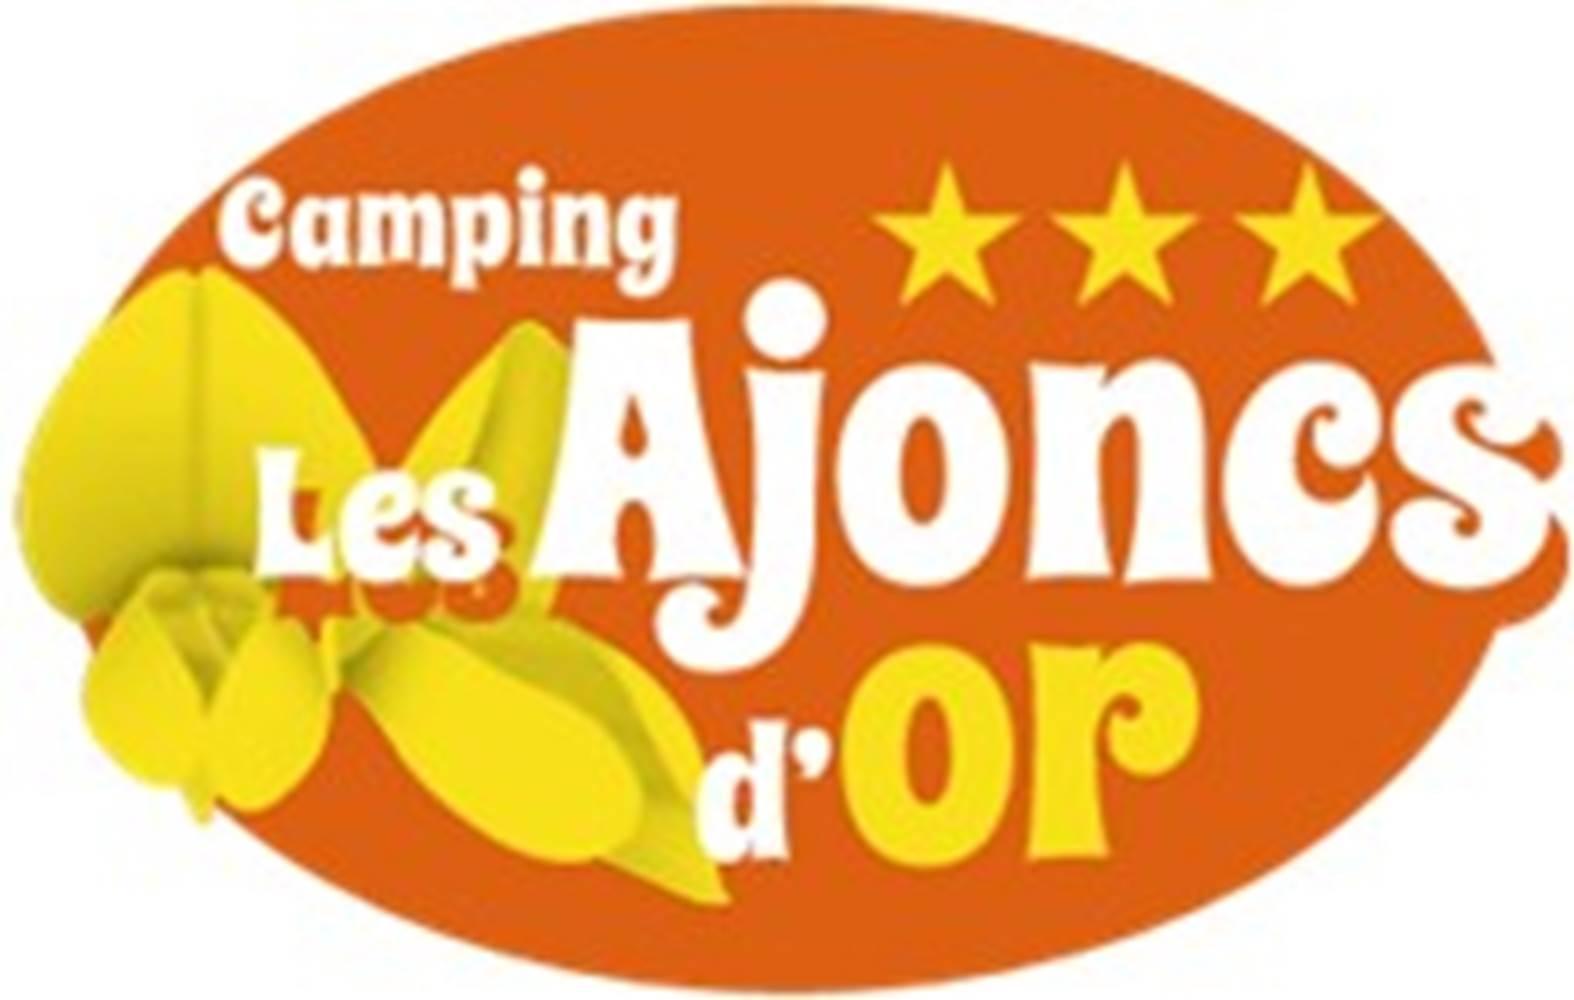 logo - ajoncs d'or - damgan - camping ©